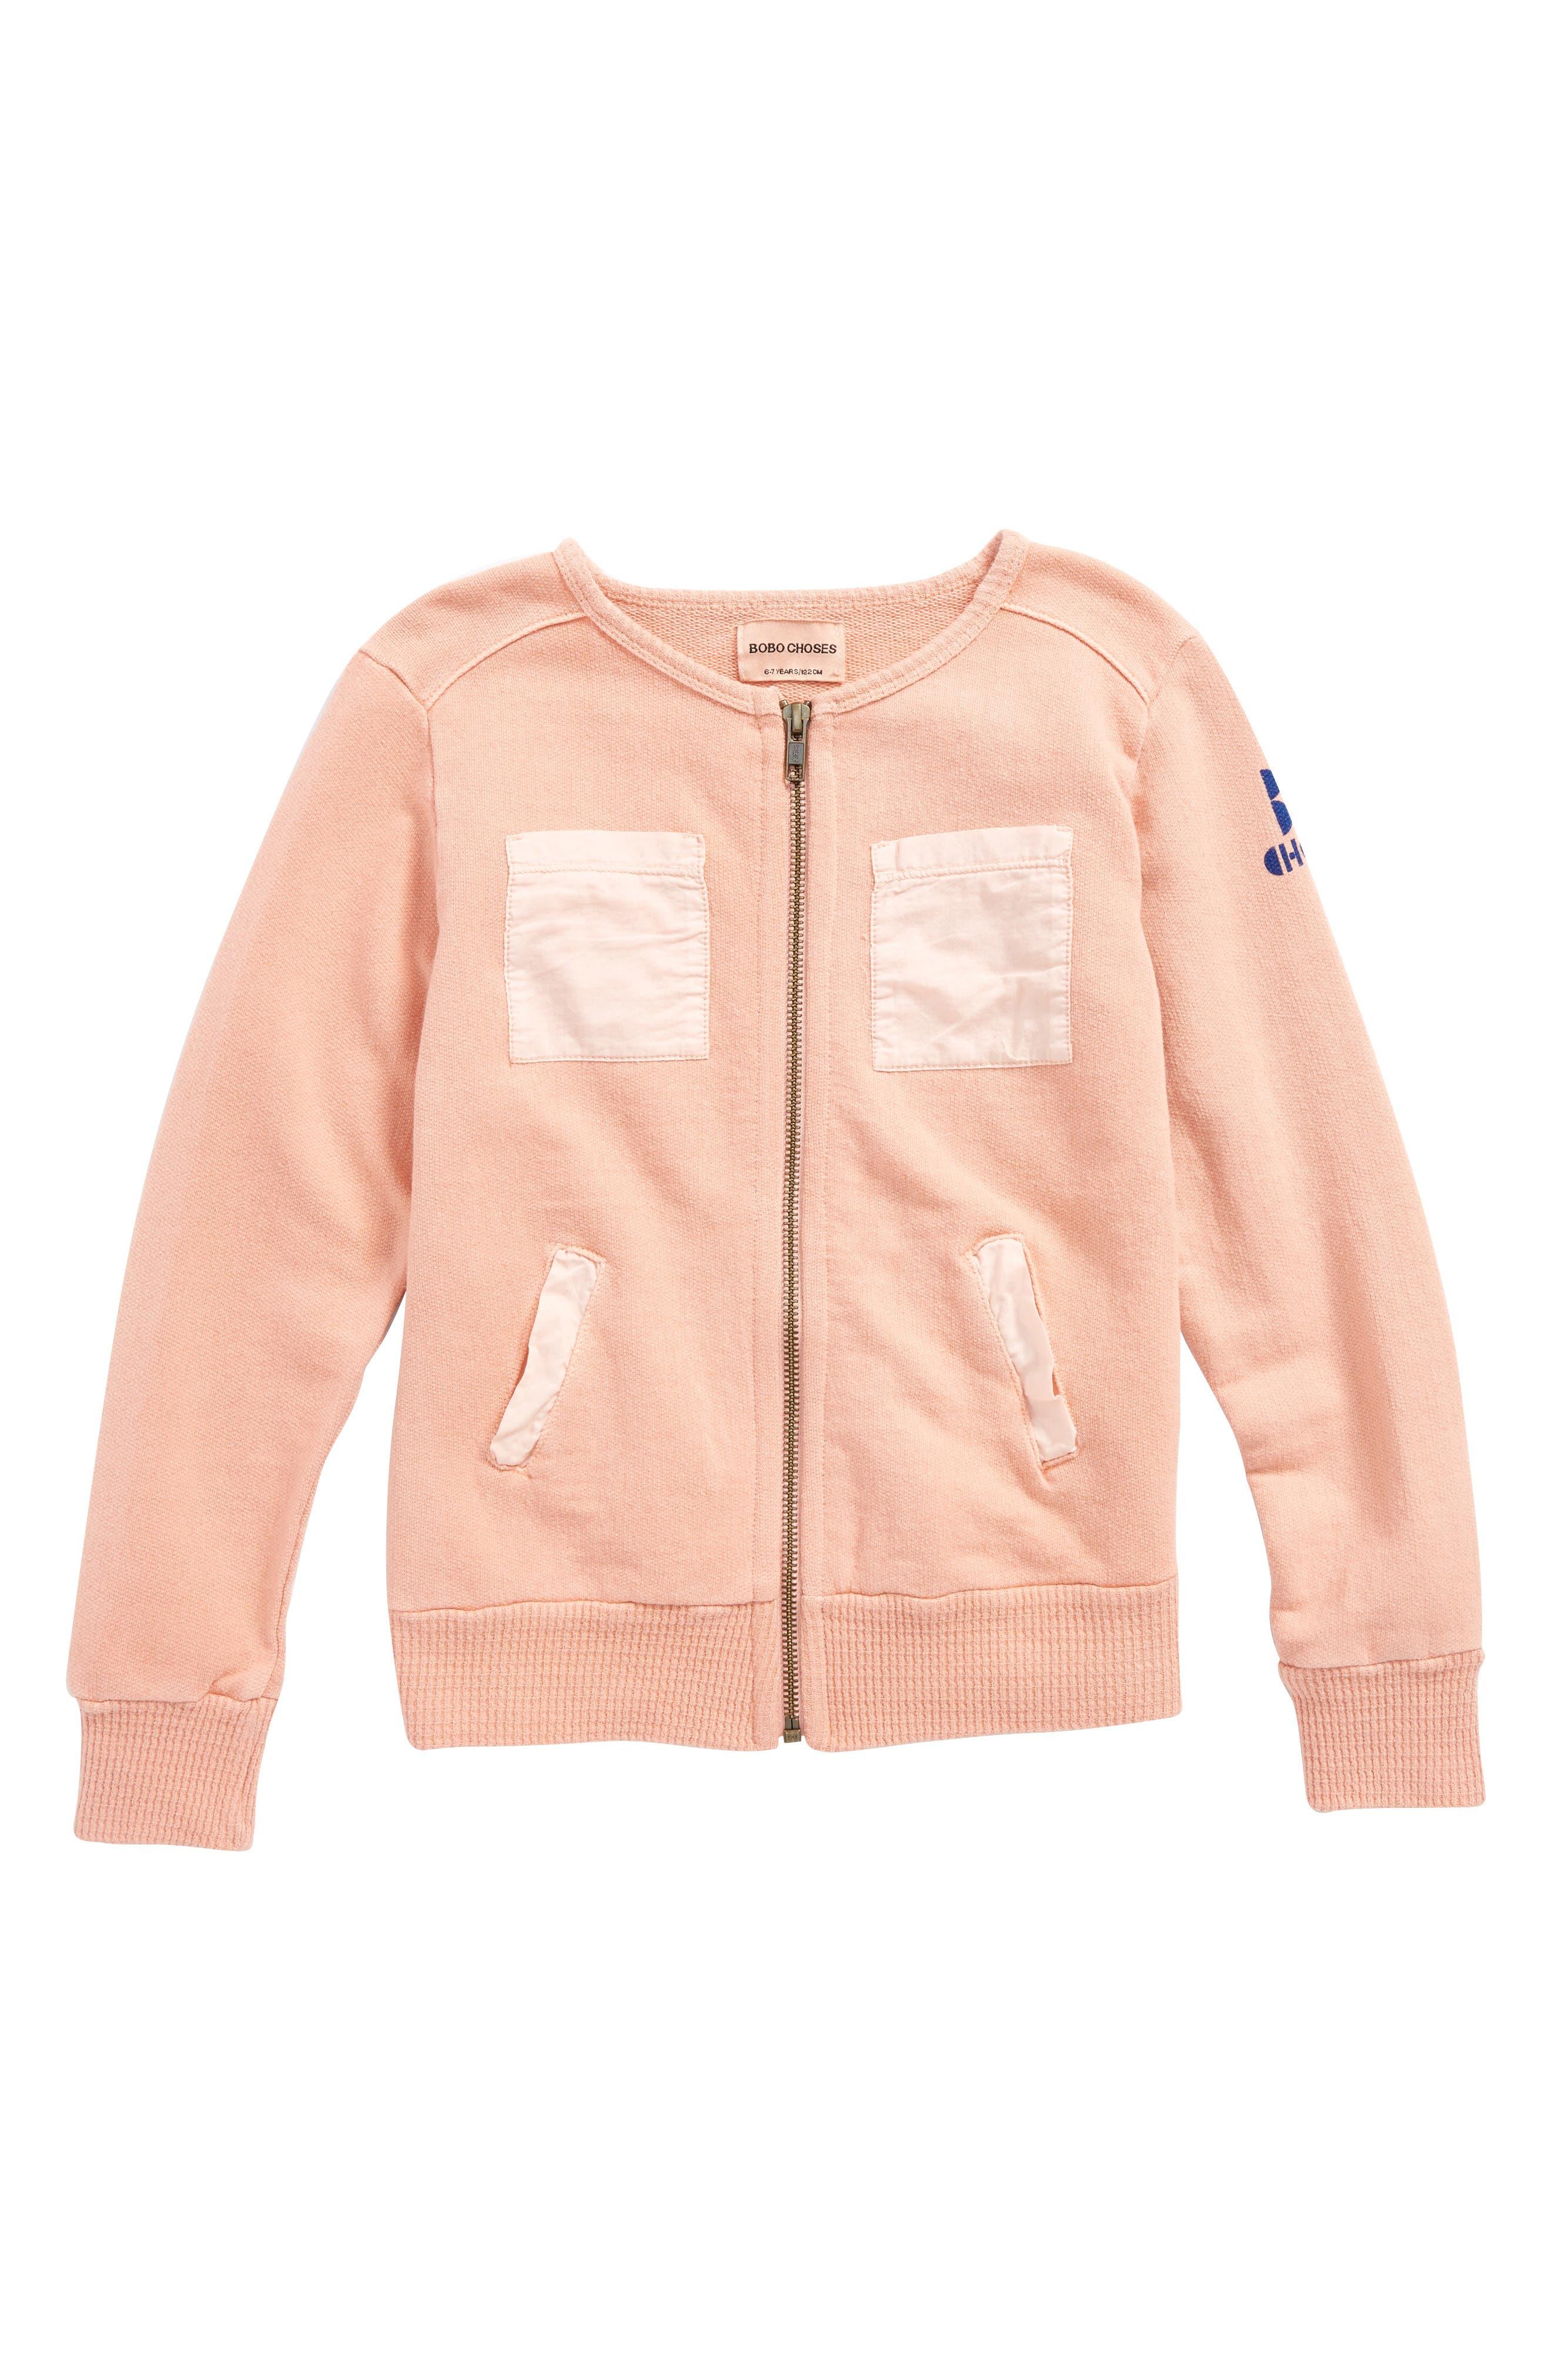 BOBO CHOSES Organic Cotton Zip Jacket, Main, color, 653